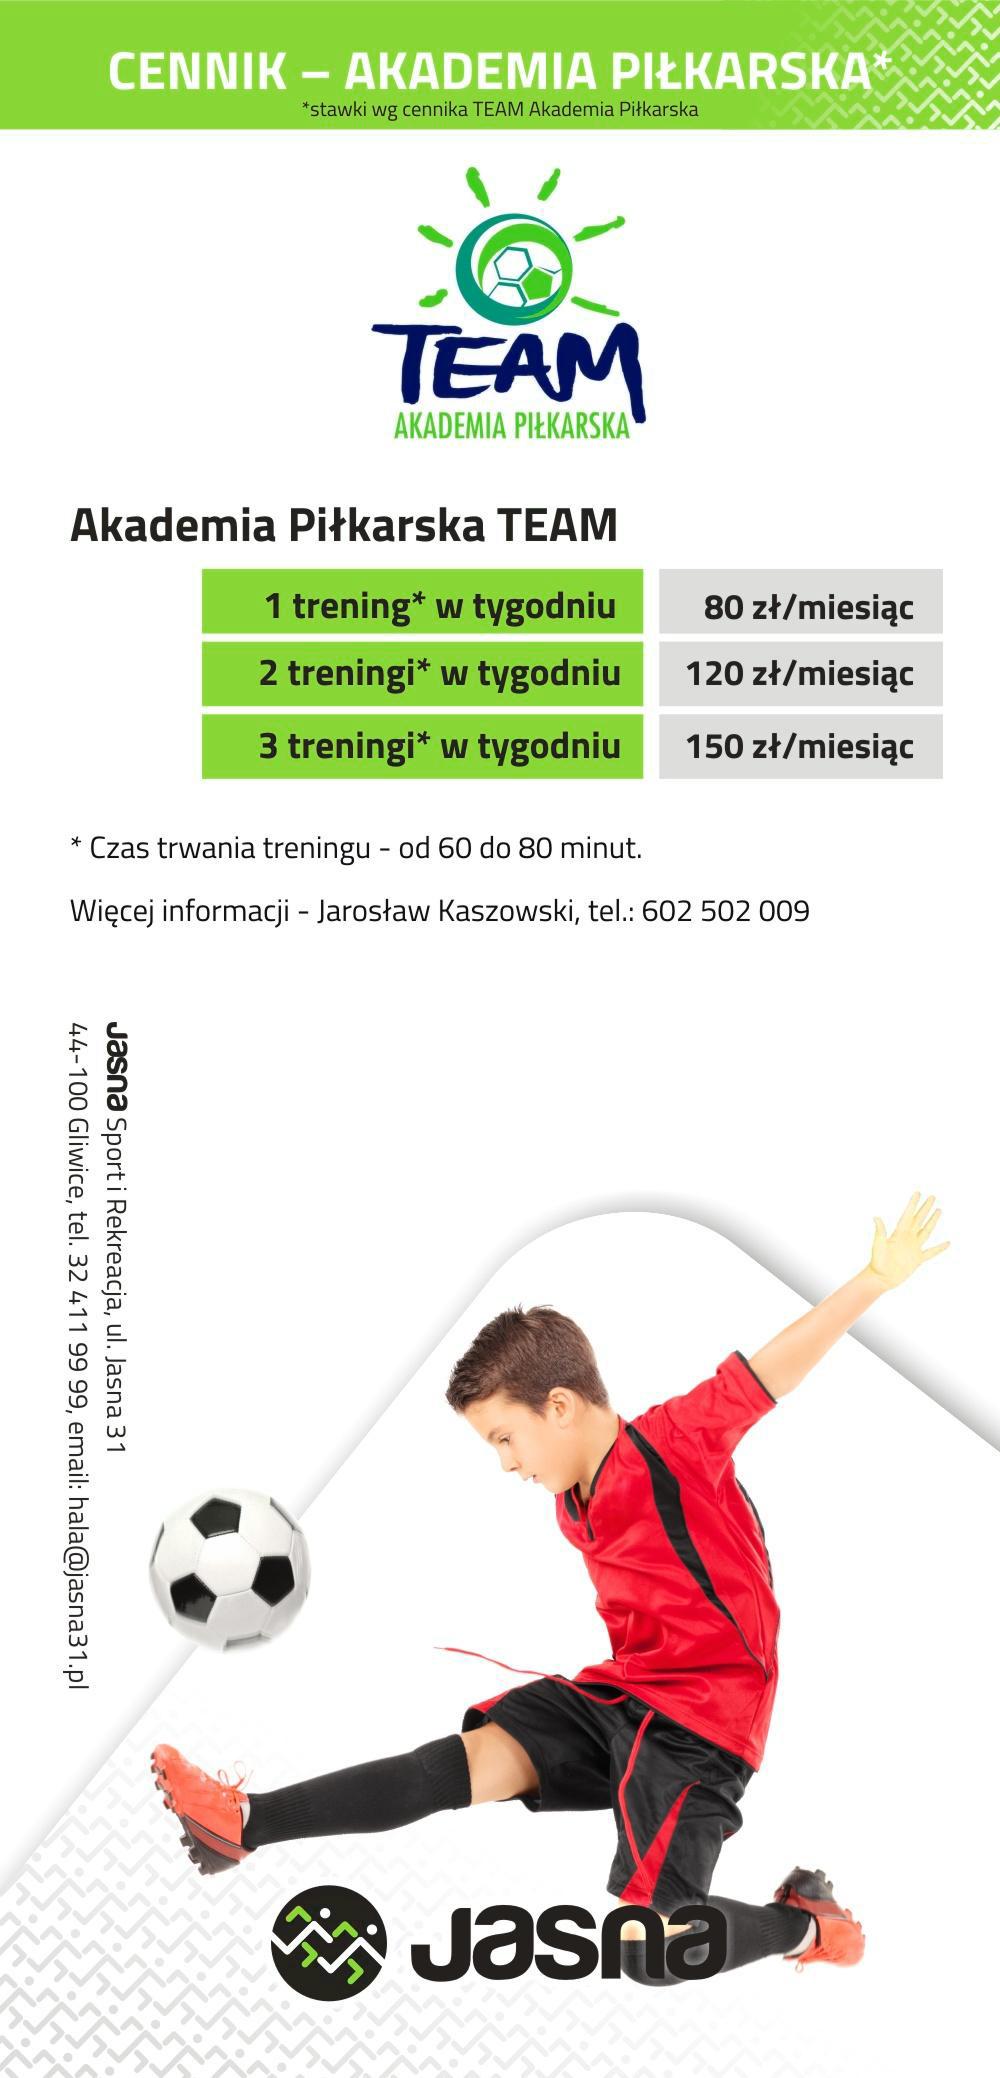 Cennik Piłka nożna - Jasna 31 Gliwice